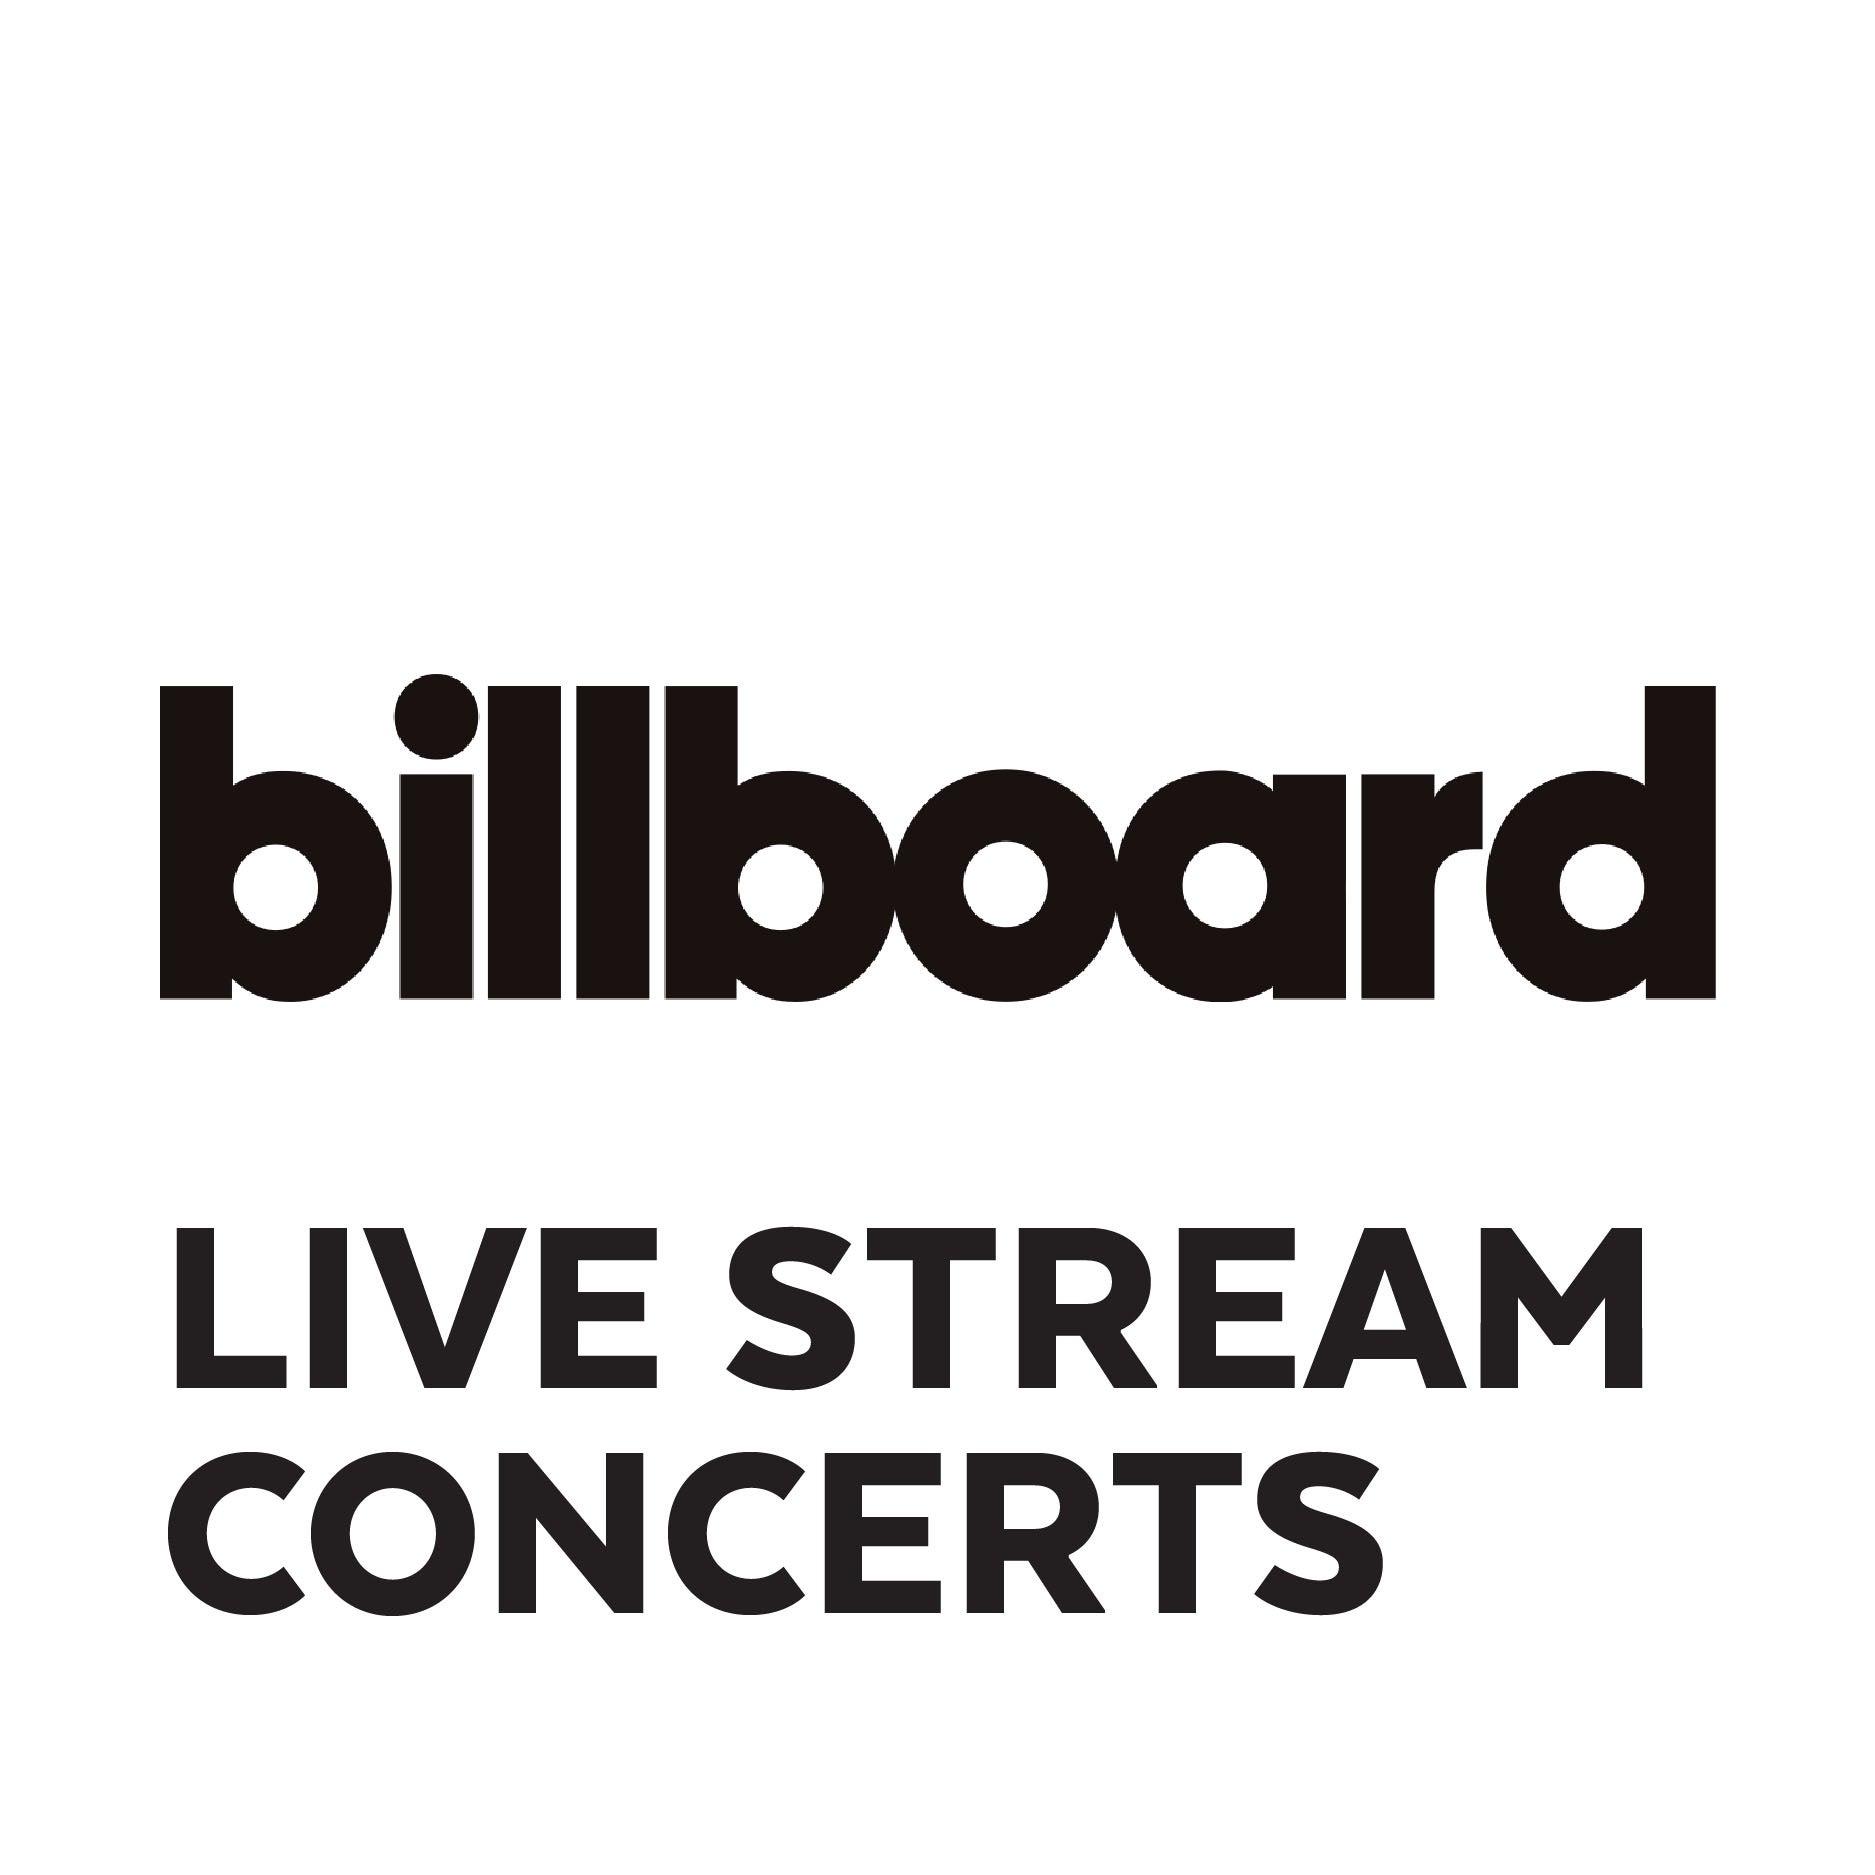 BillboardConcerts-01.jpg